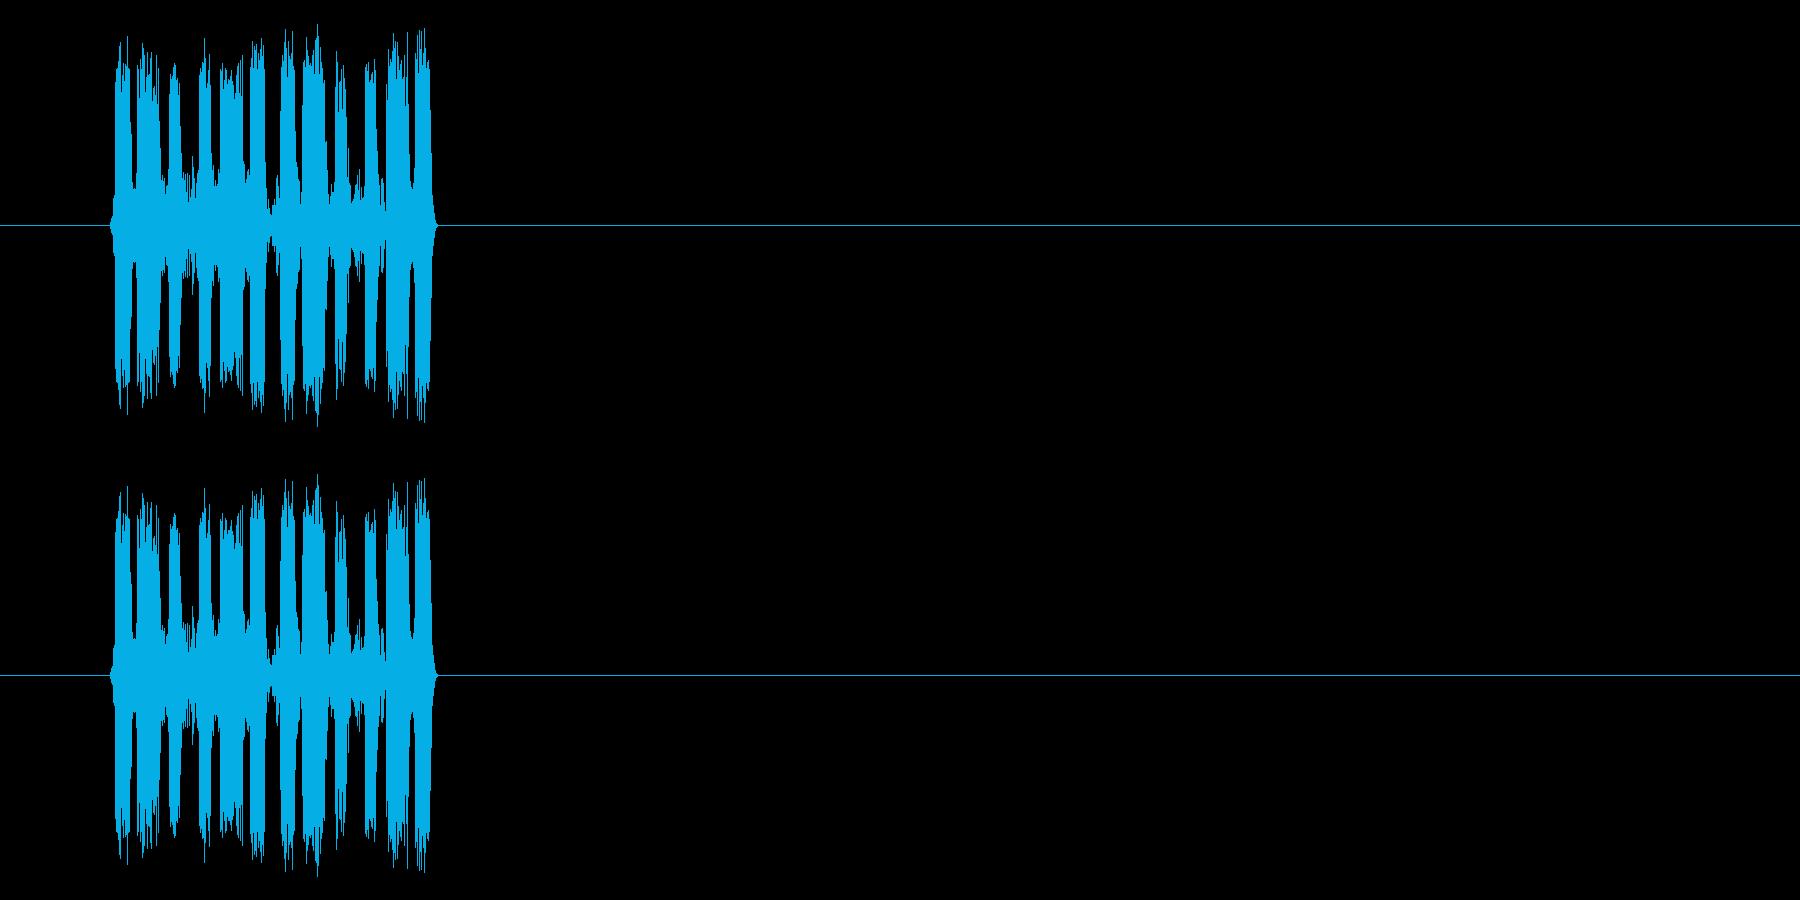 【NES RPG03-07(魔法 氷)】の再生済みの波形